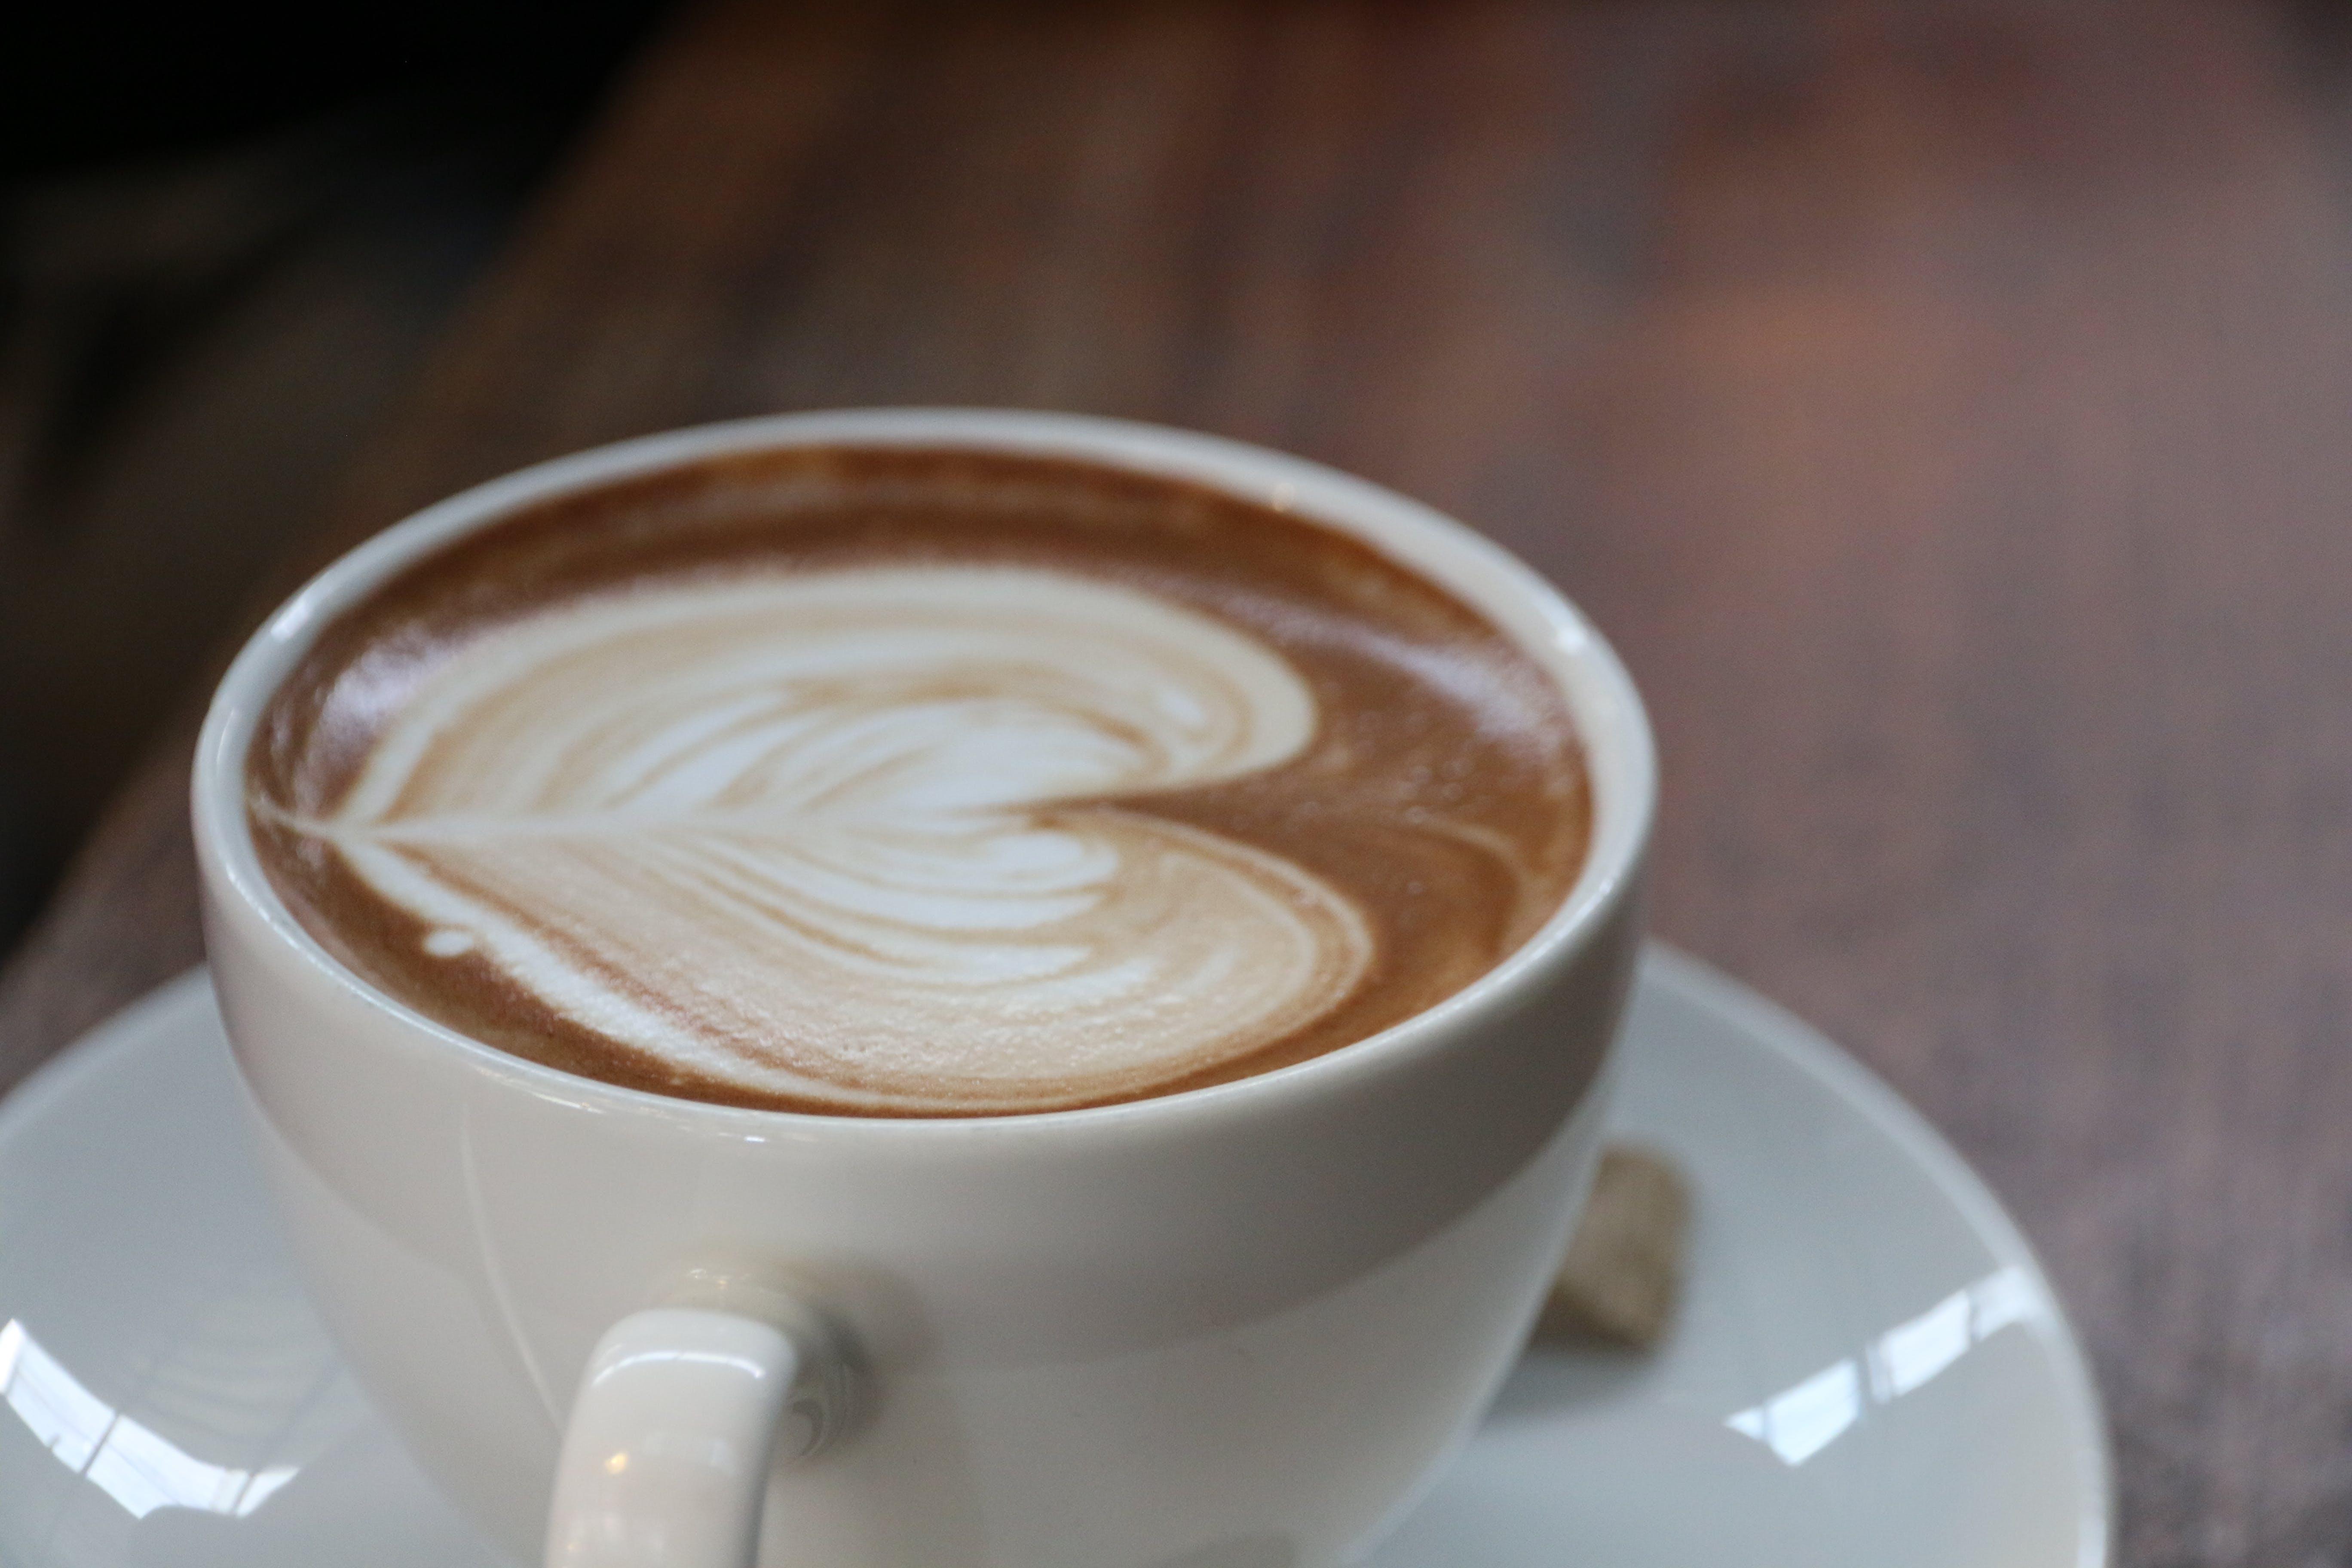 Kostenloses Stock Foto zu becher, cappuccino, espresso, kaffeebecher